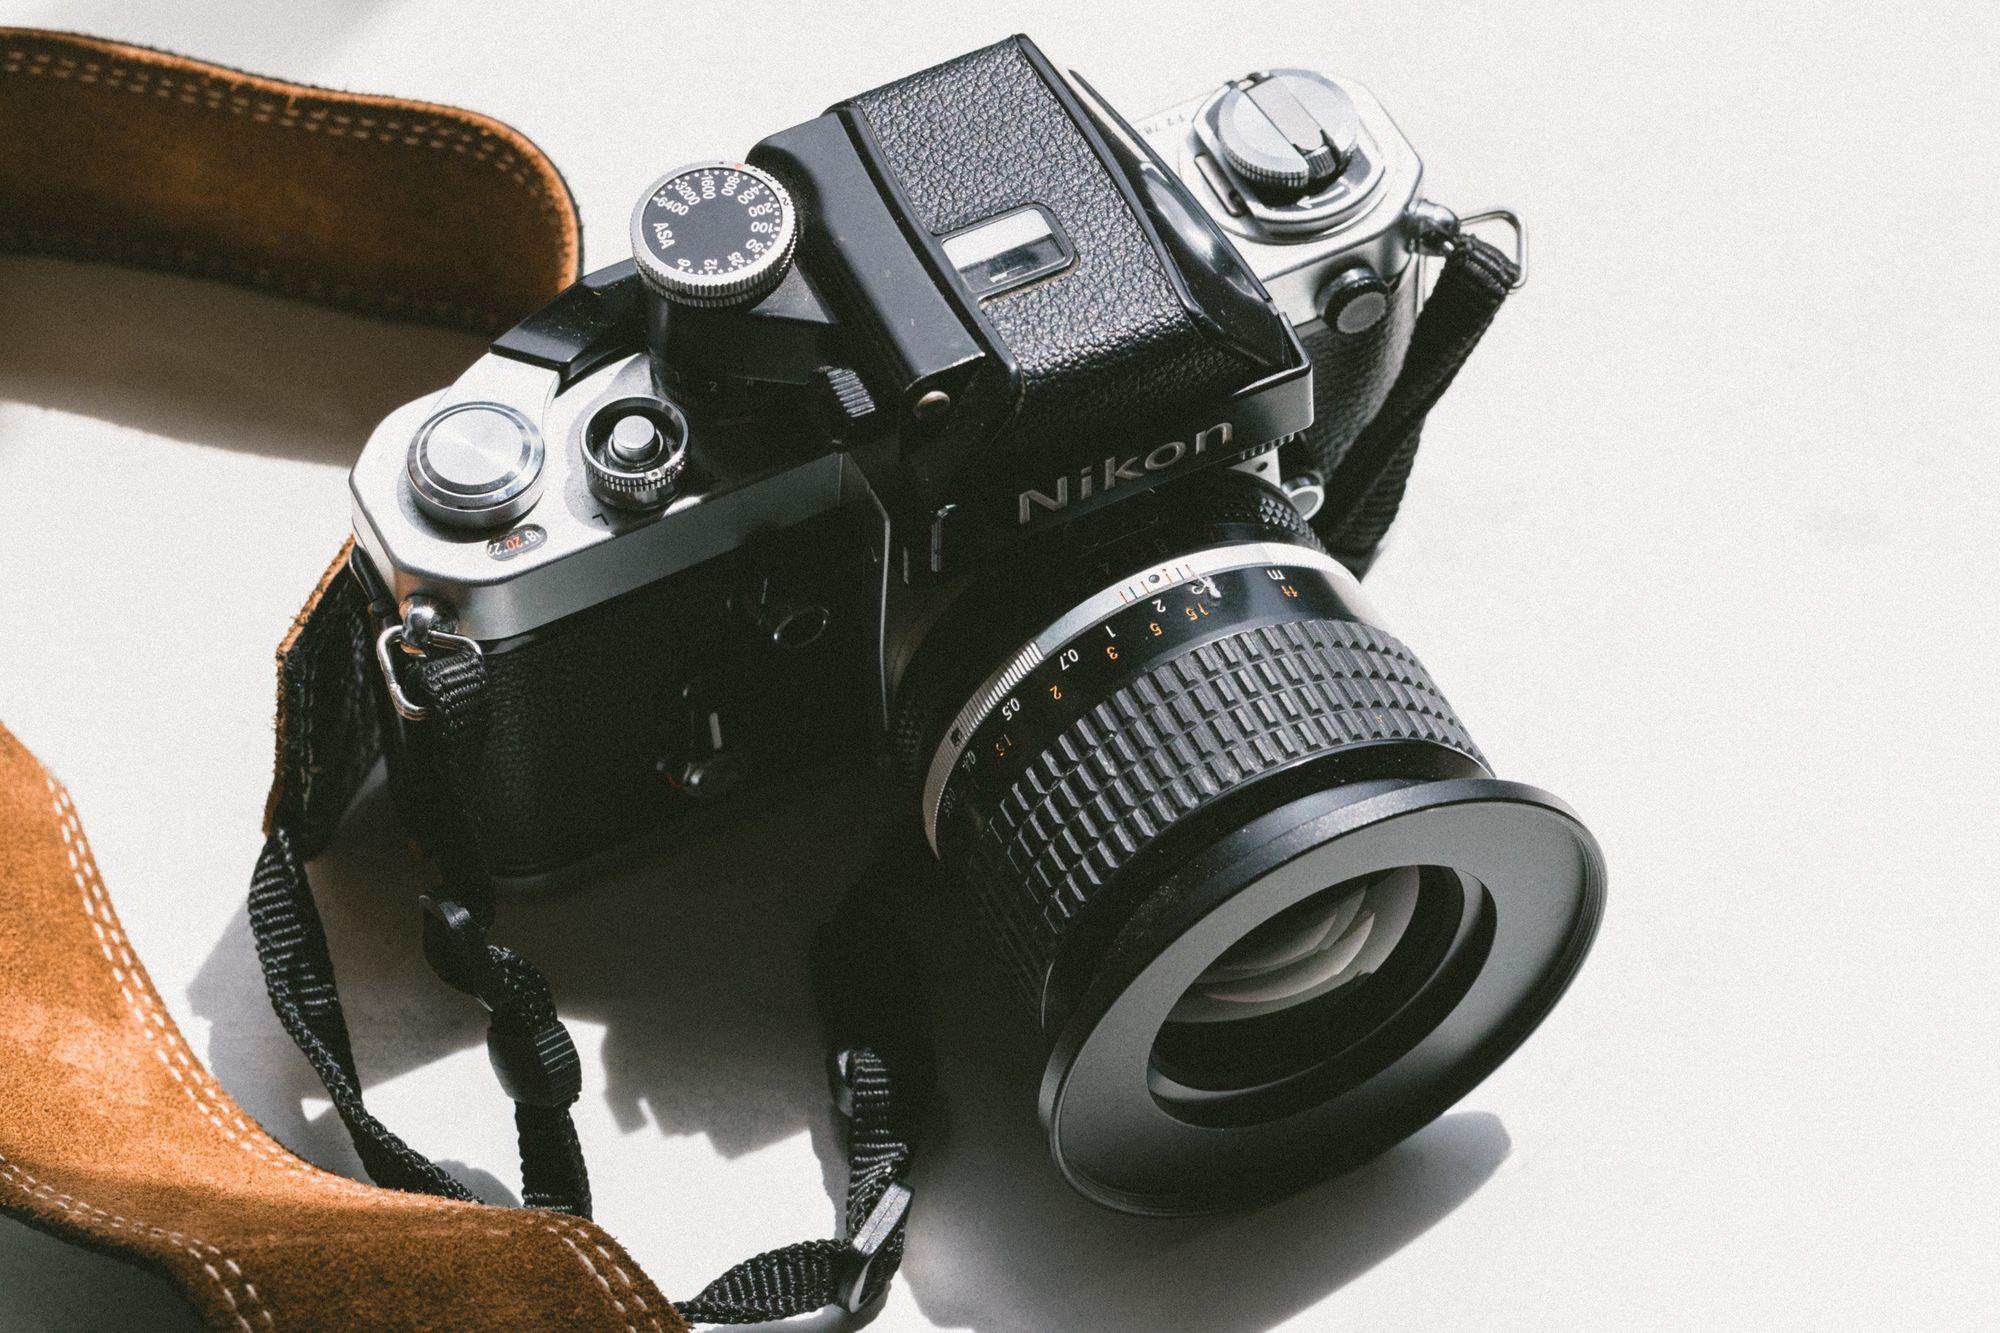 The Nikon F3 is a classic fashion photography camera